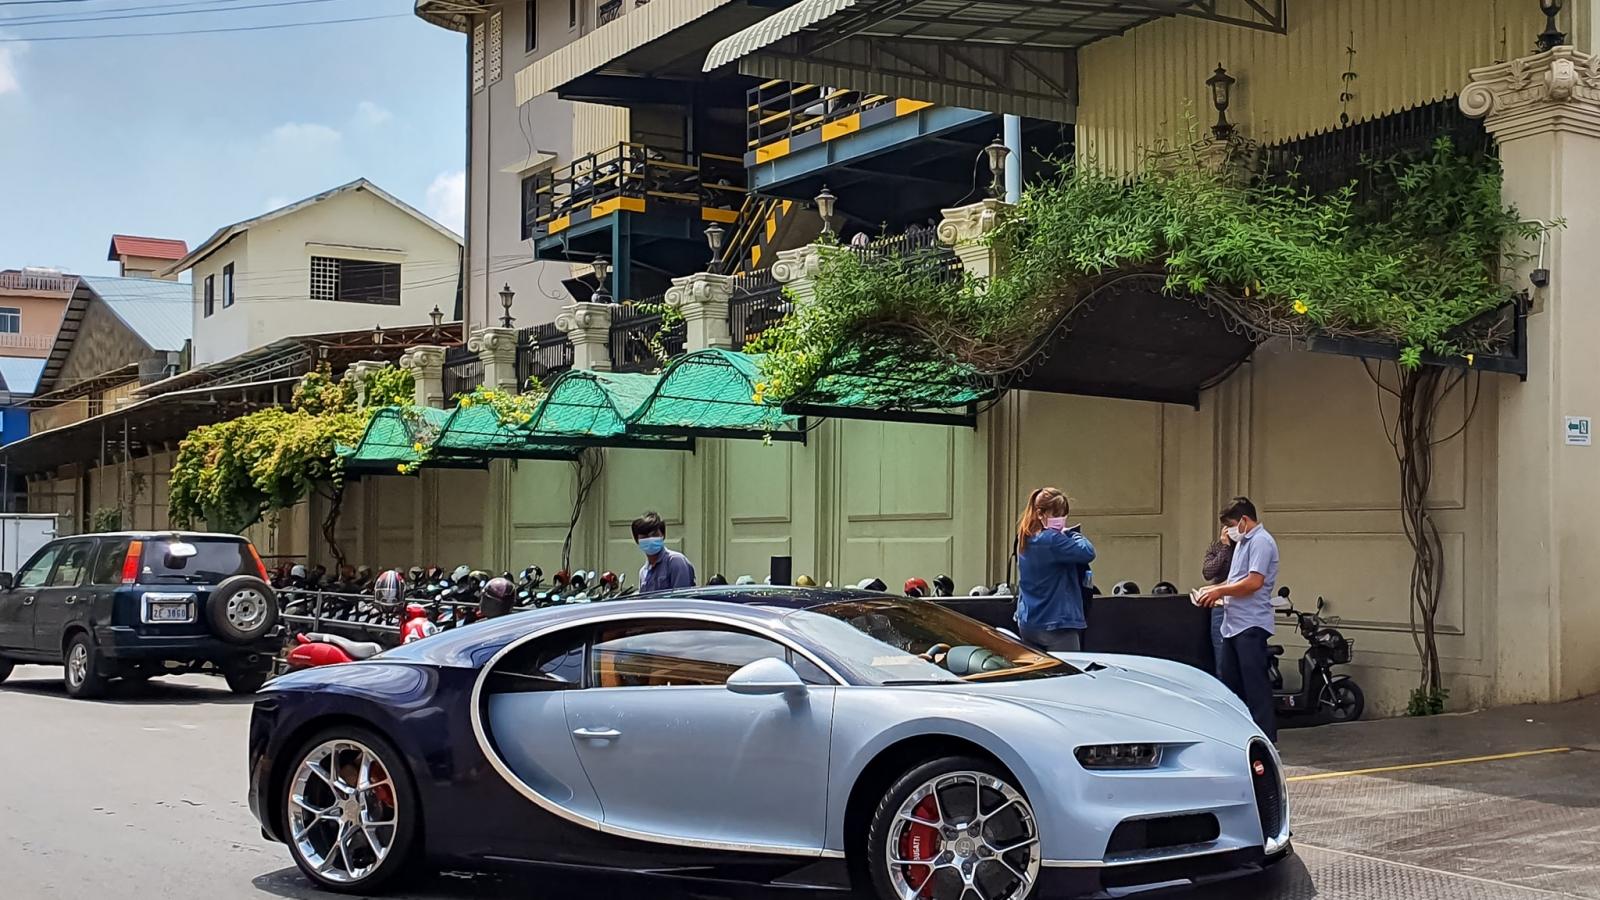 Bugatti Chiron thứ ba đặt chân đến Campuchia